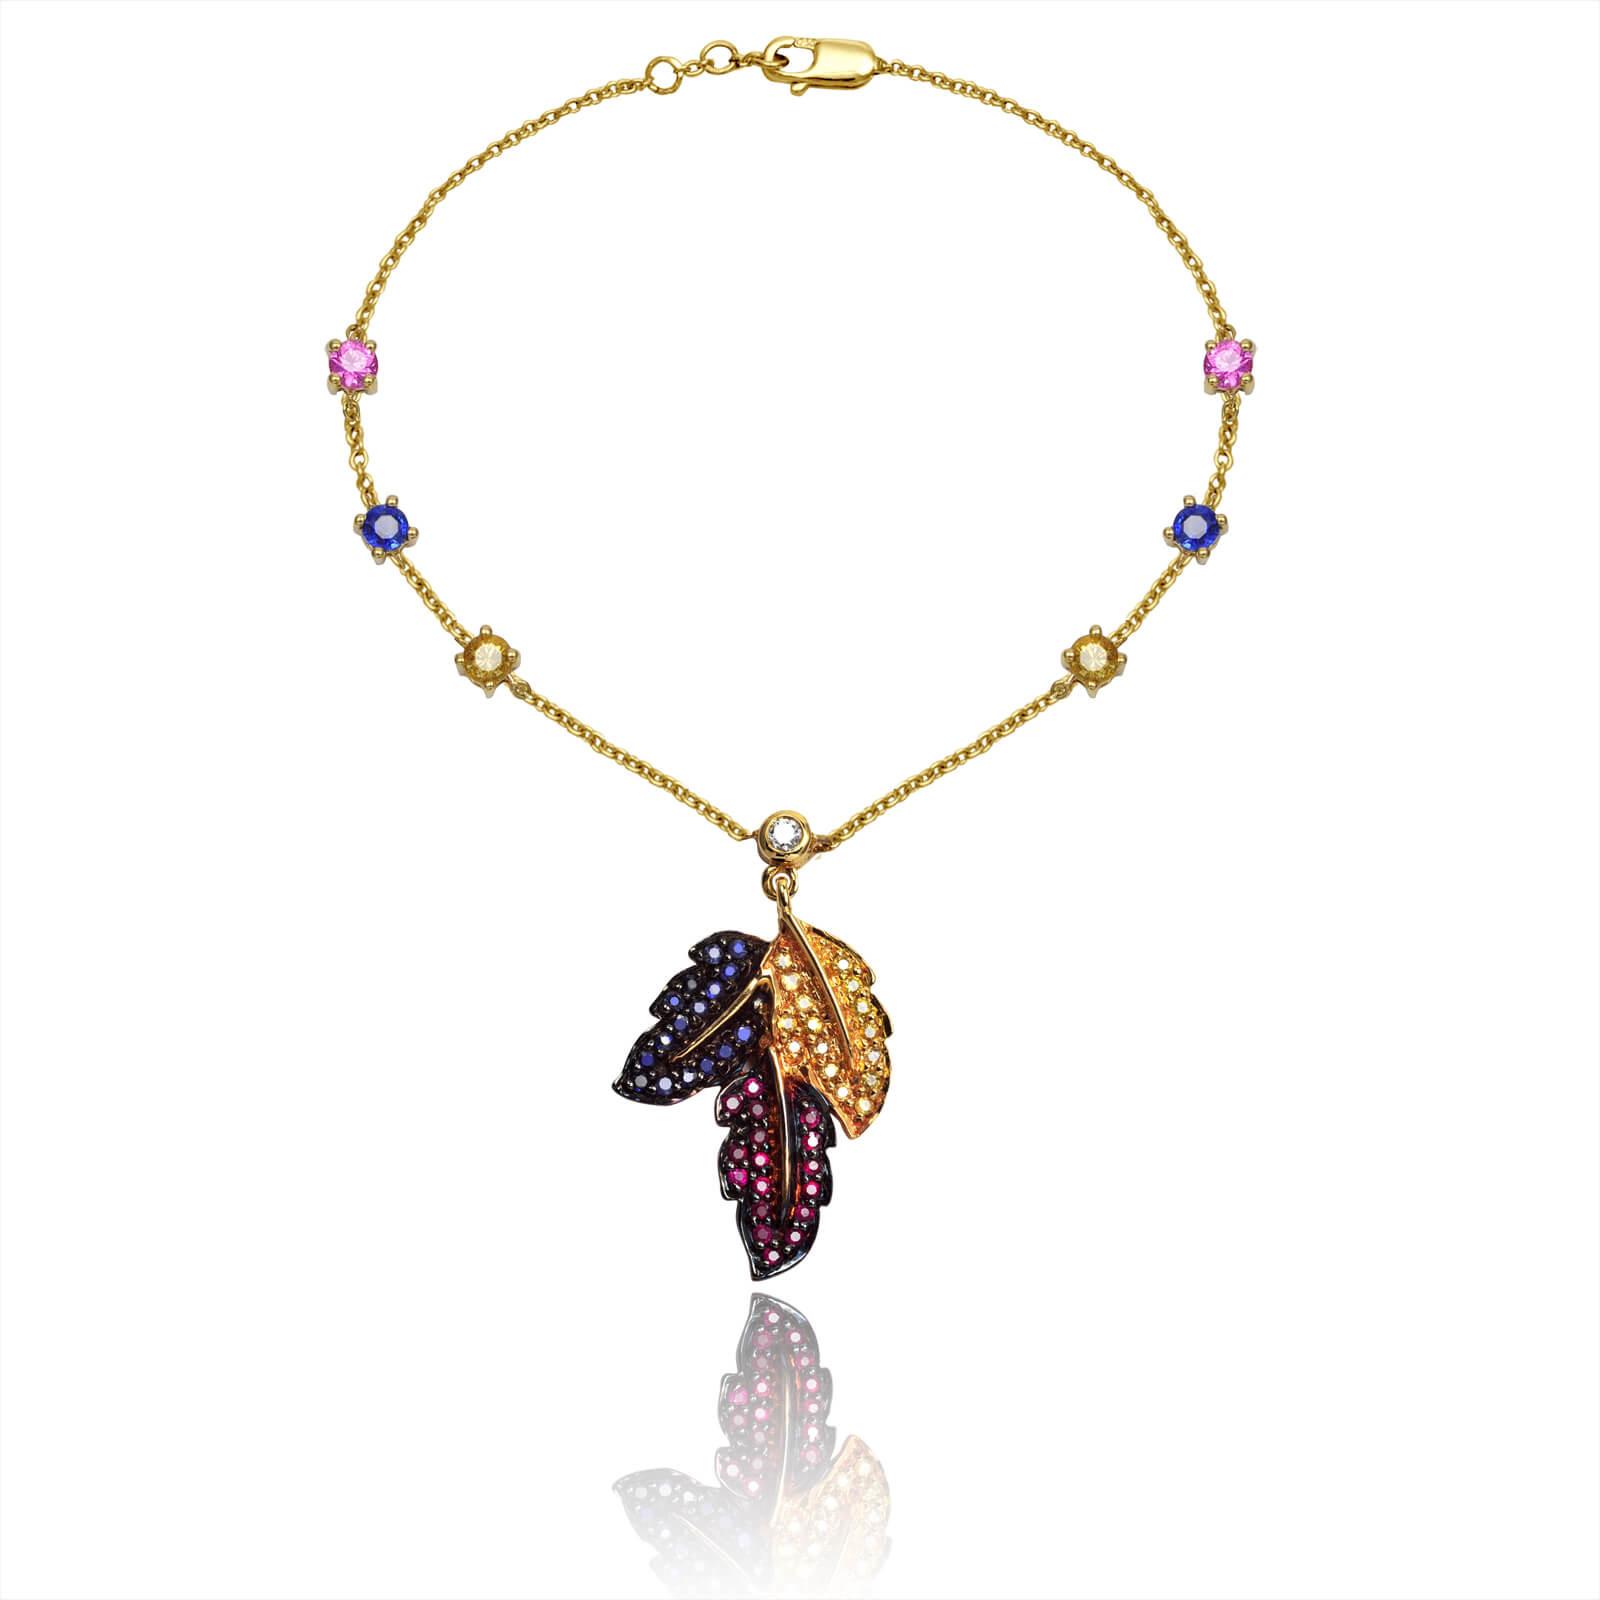 cbr0327cls-bracelet-feuilles-dautomne